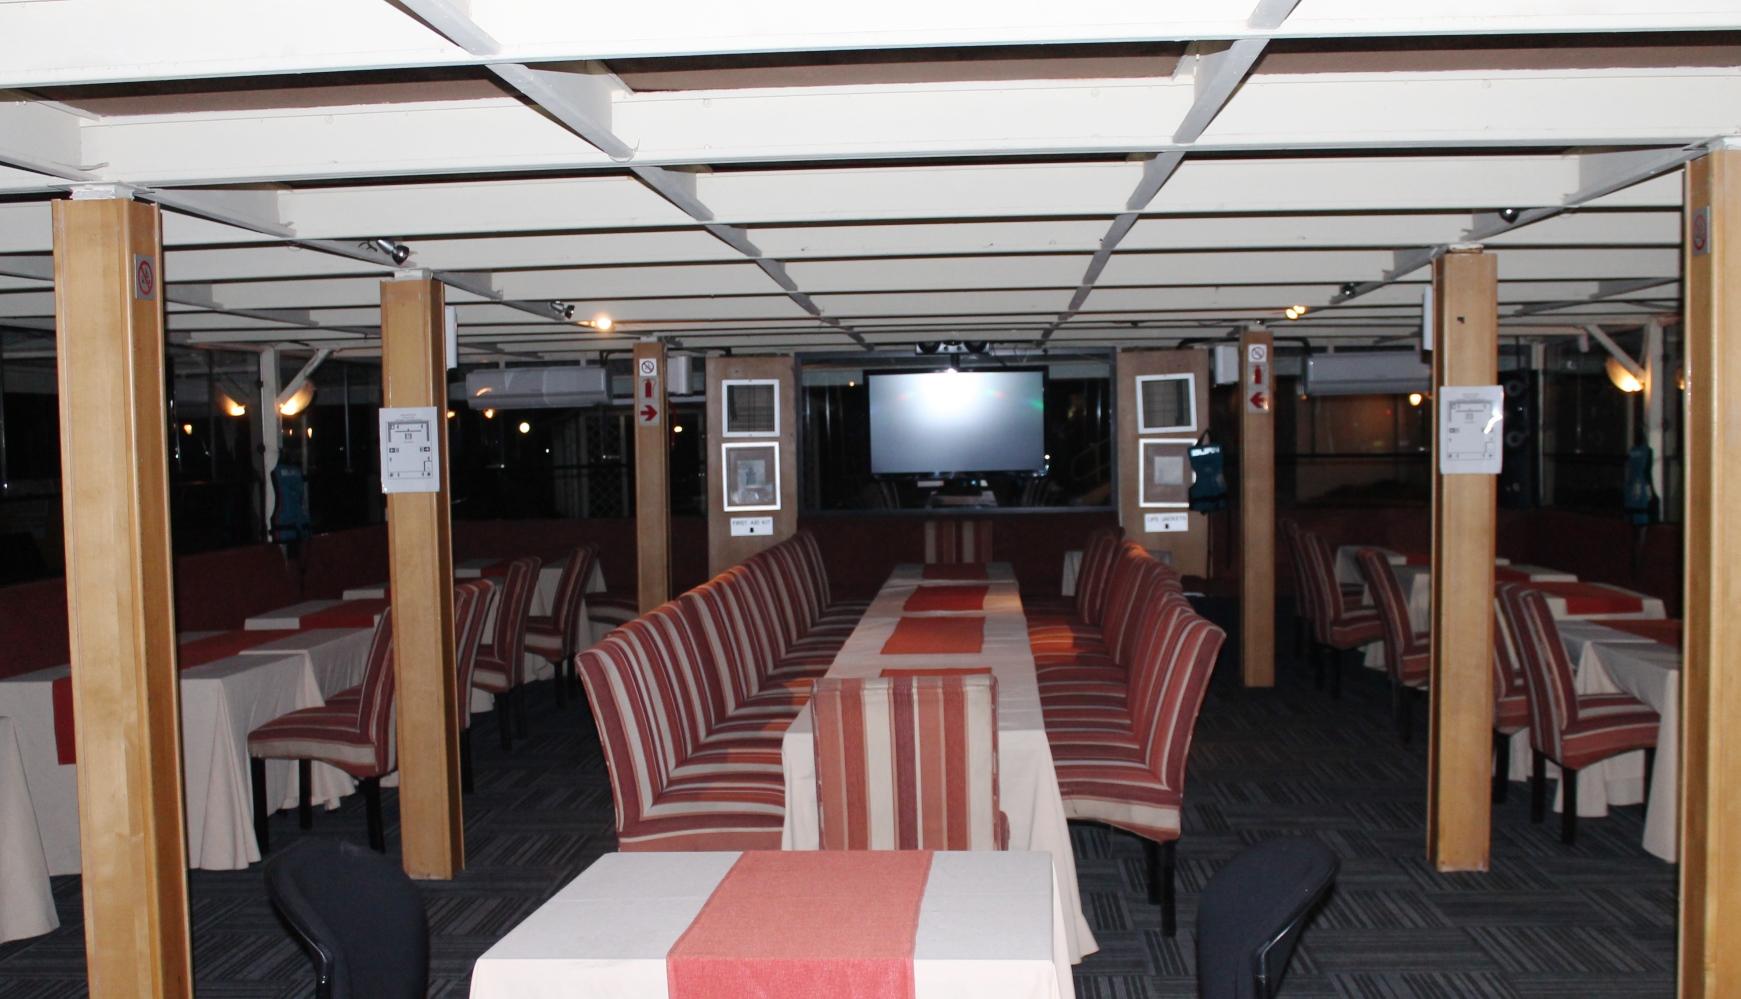 Bon Hotel Riviera on Vaal - inside riverboat